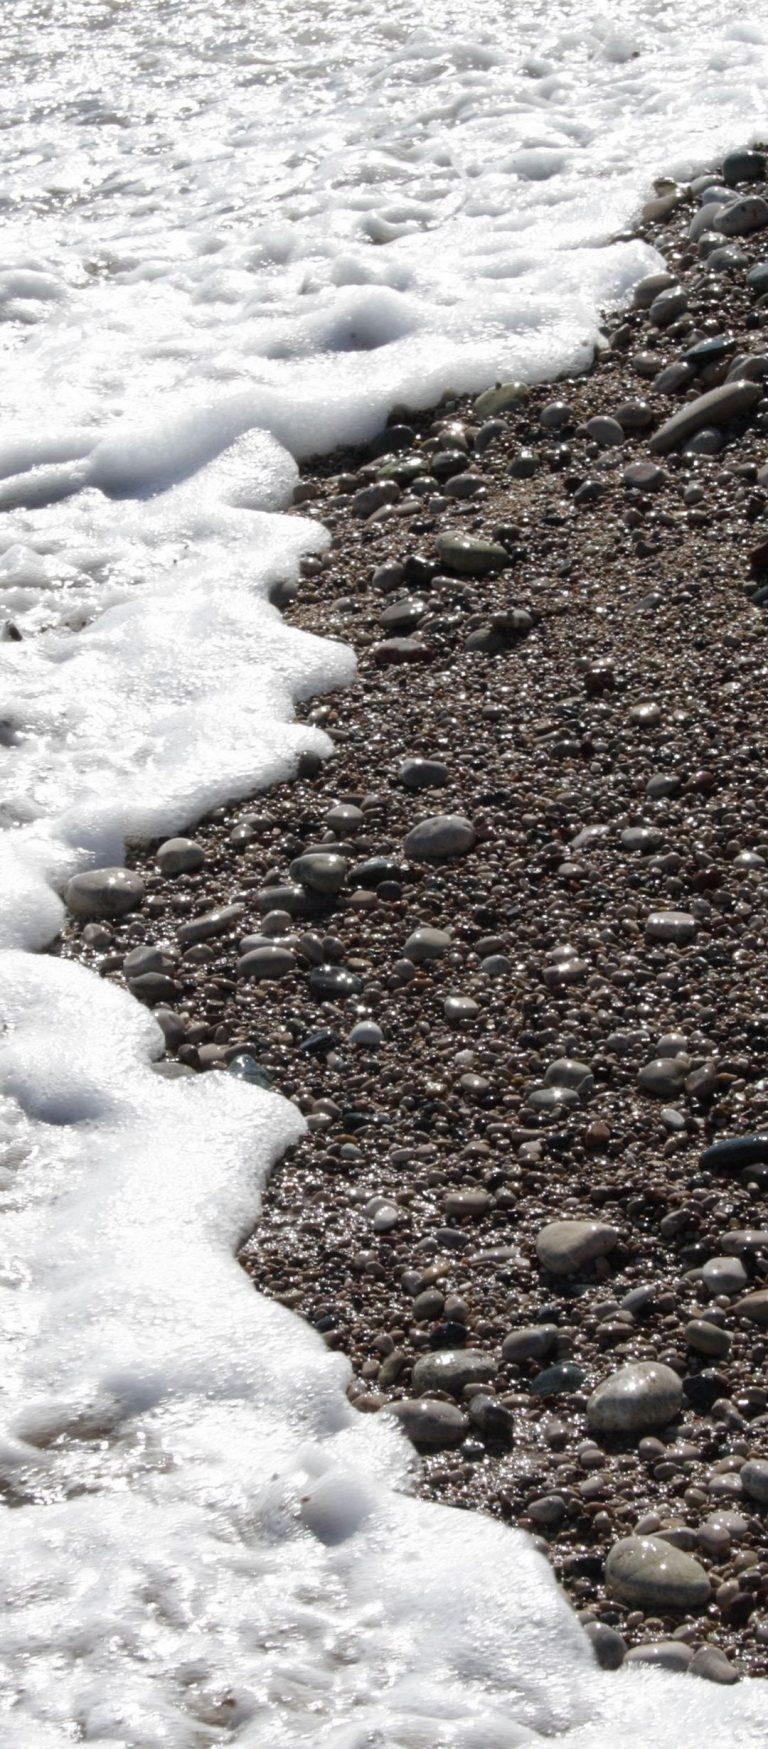 Pebble Stones Sea Waves Whisper Foam 1080x2460 768x1749